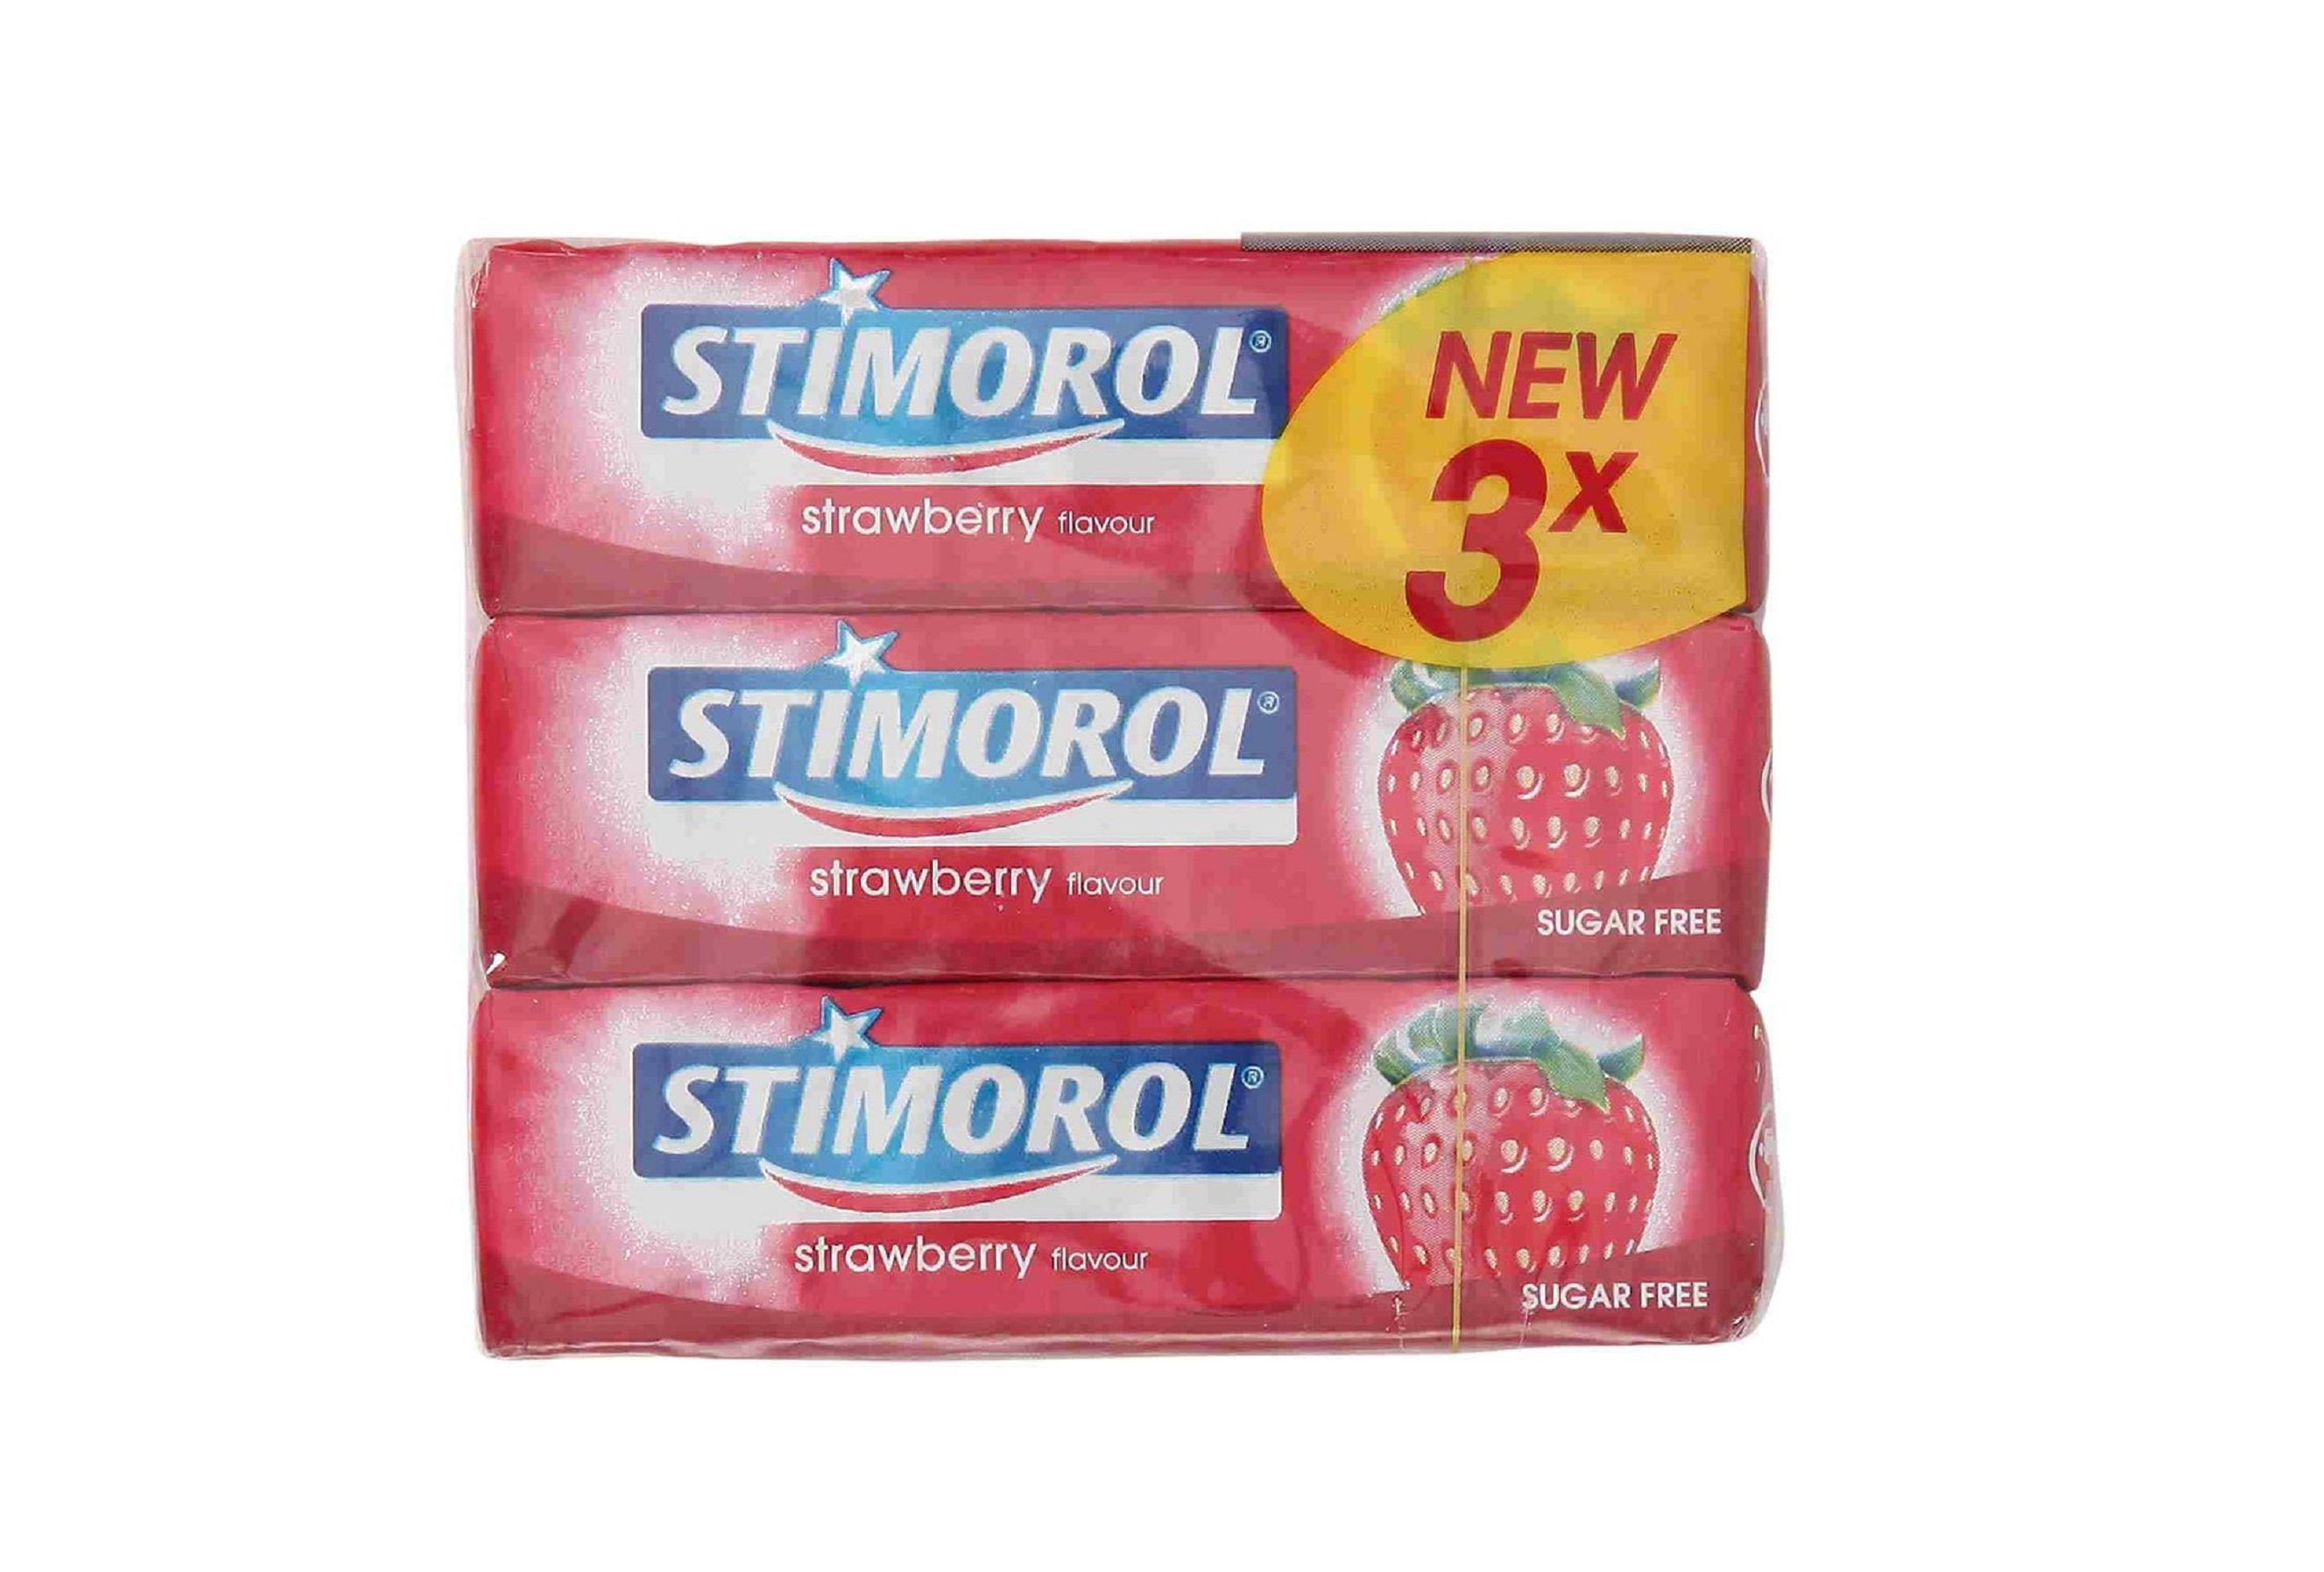 Stimorol Widescreen